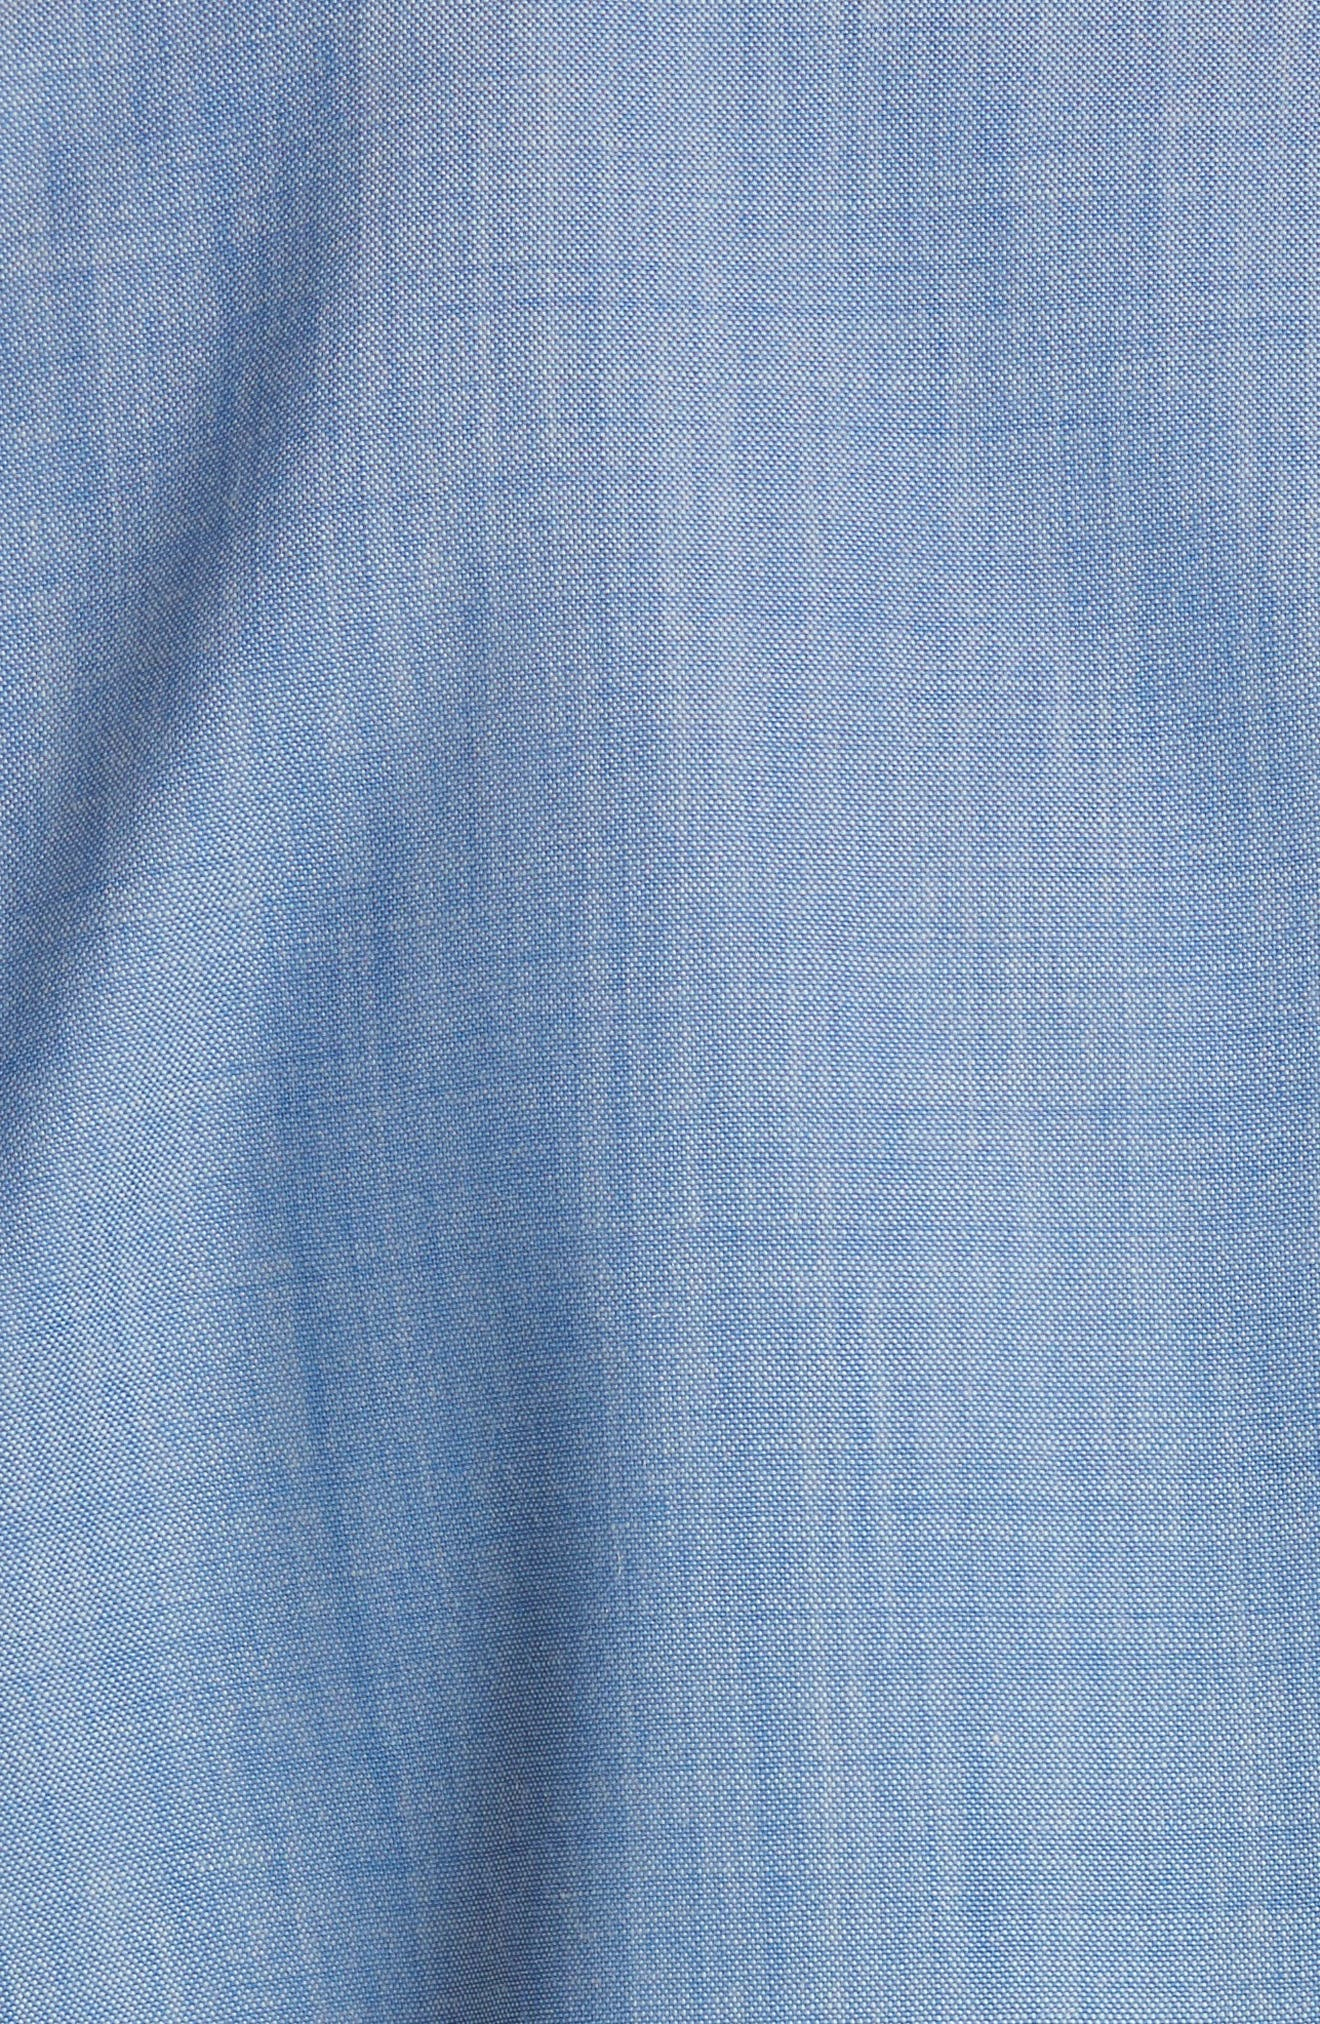 Side Cutout Wool Jacket,                             Alternate thumbnail 6, color,                             450